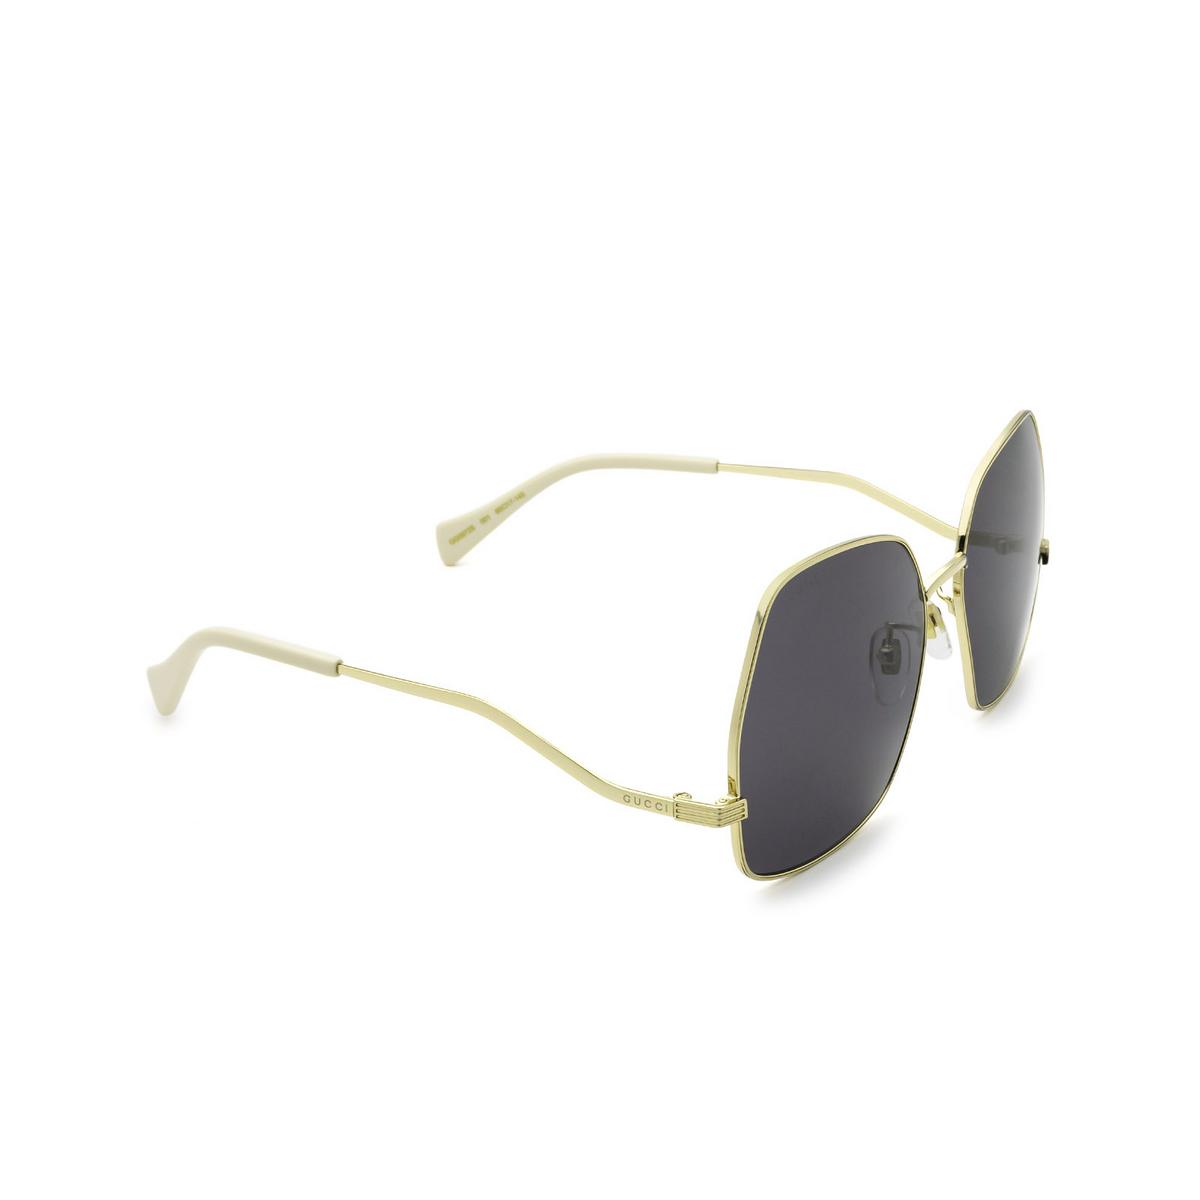 Gucci® Irregular Sunglasses: GG0972S color Gold 001 - three-quarters view.